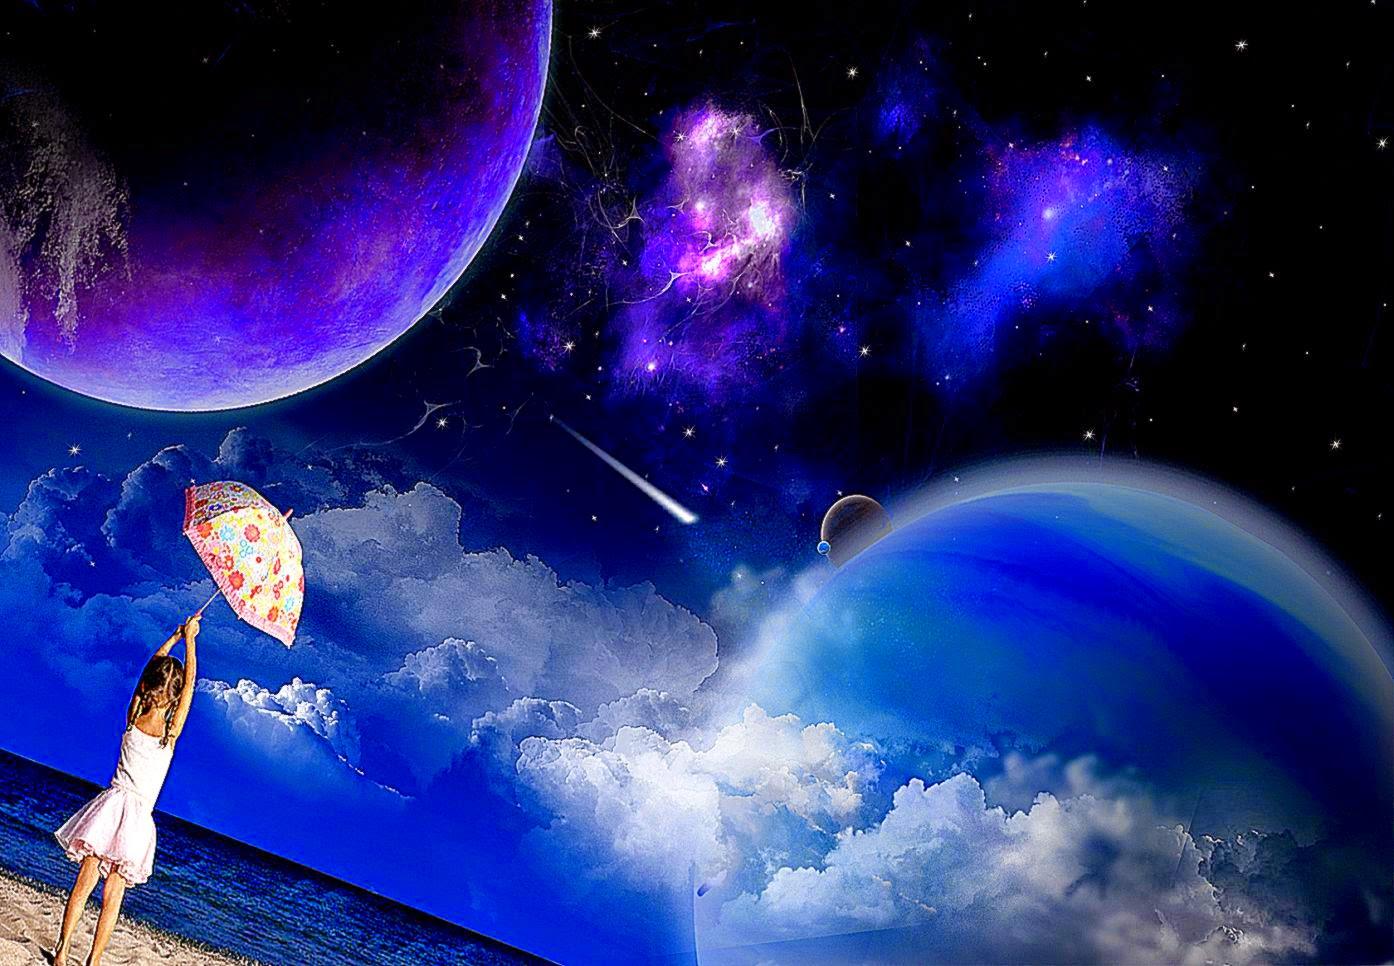 3d Space Background Wallpaper: 3D Art Space Wallpapers Hd Desktop